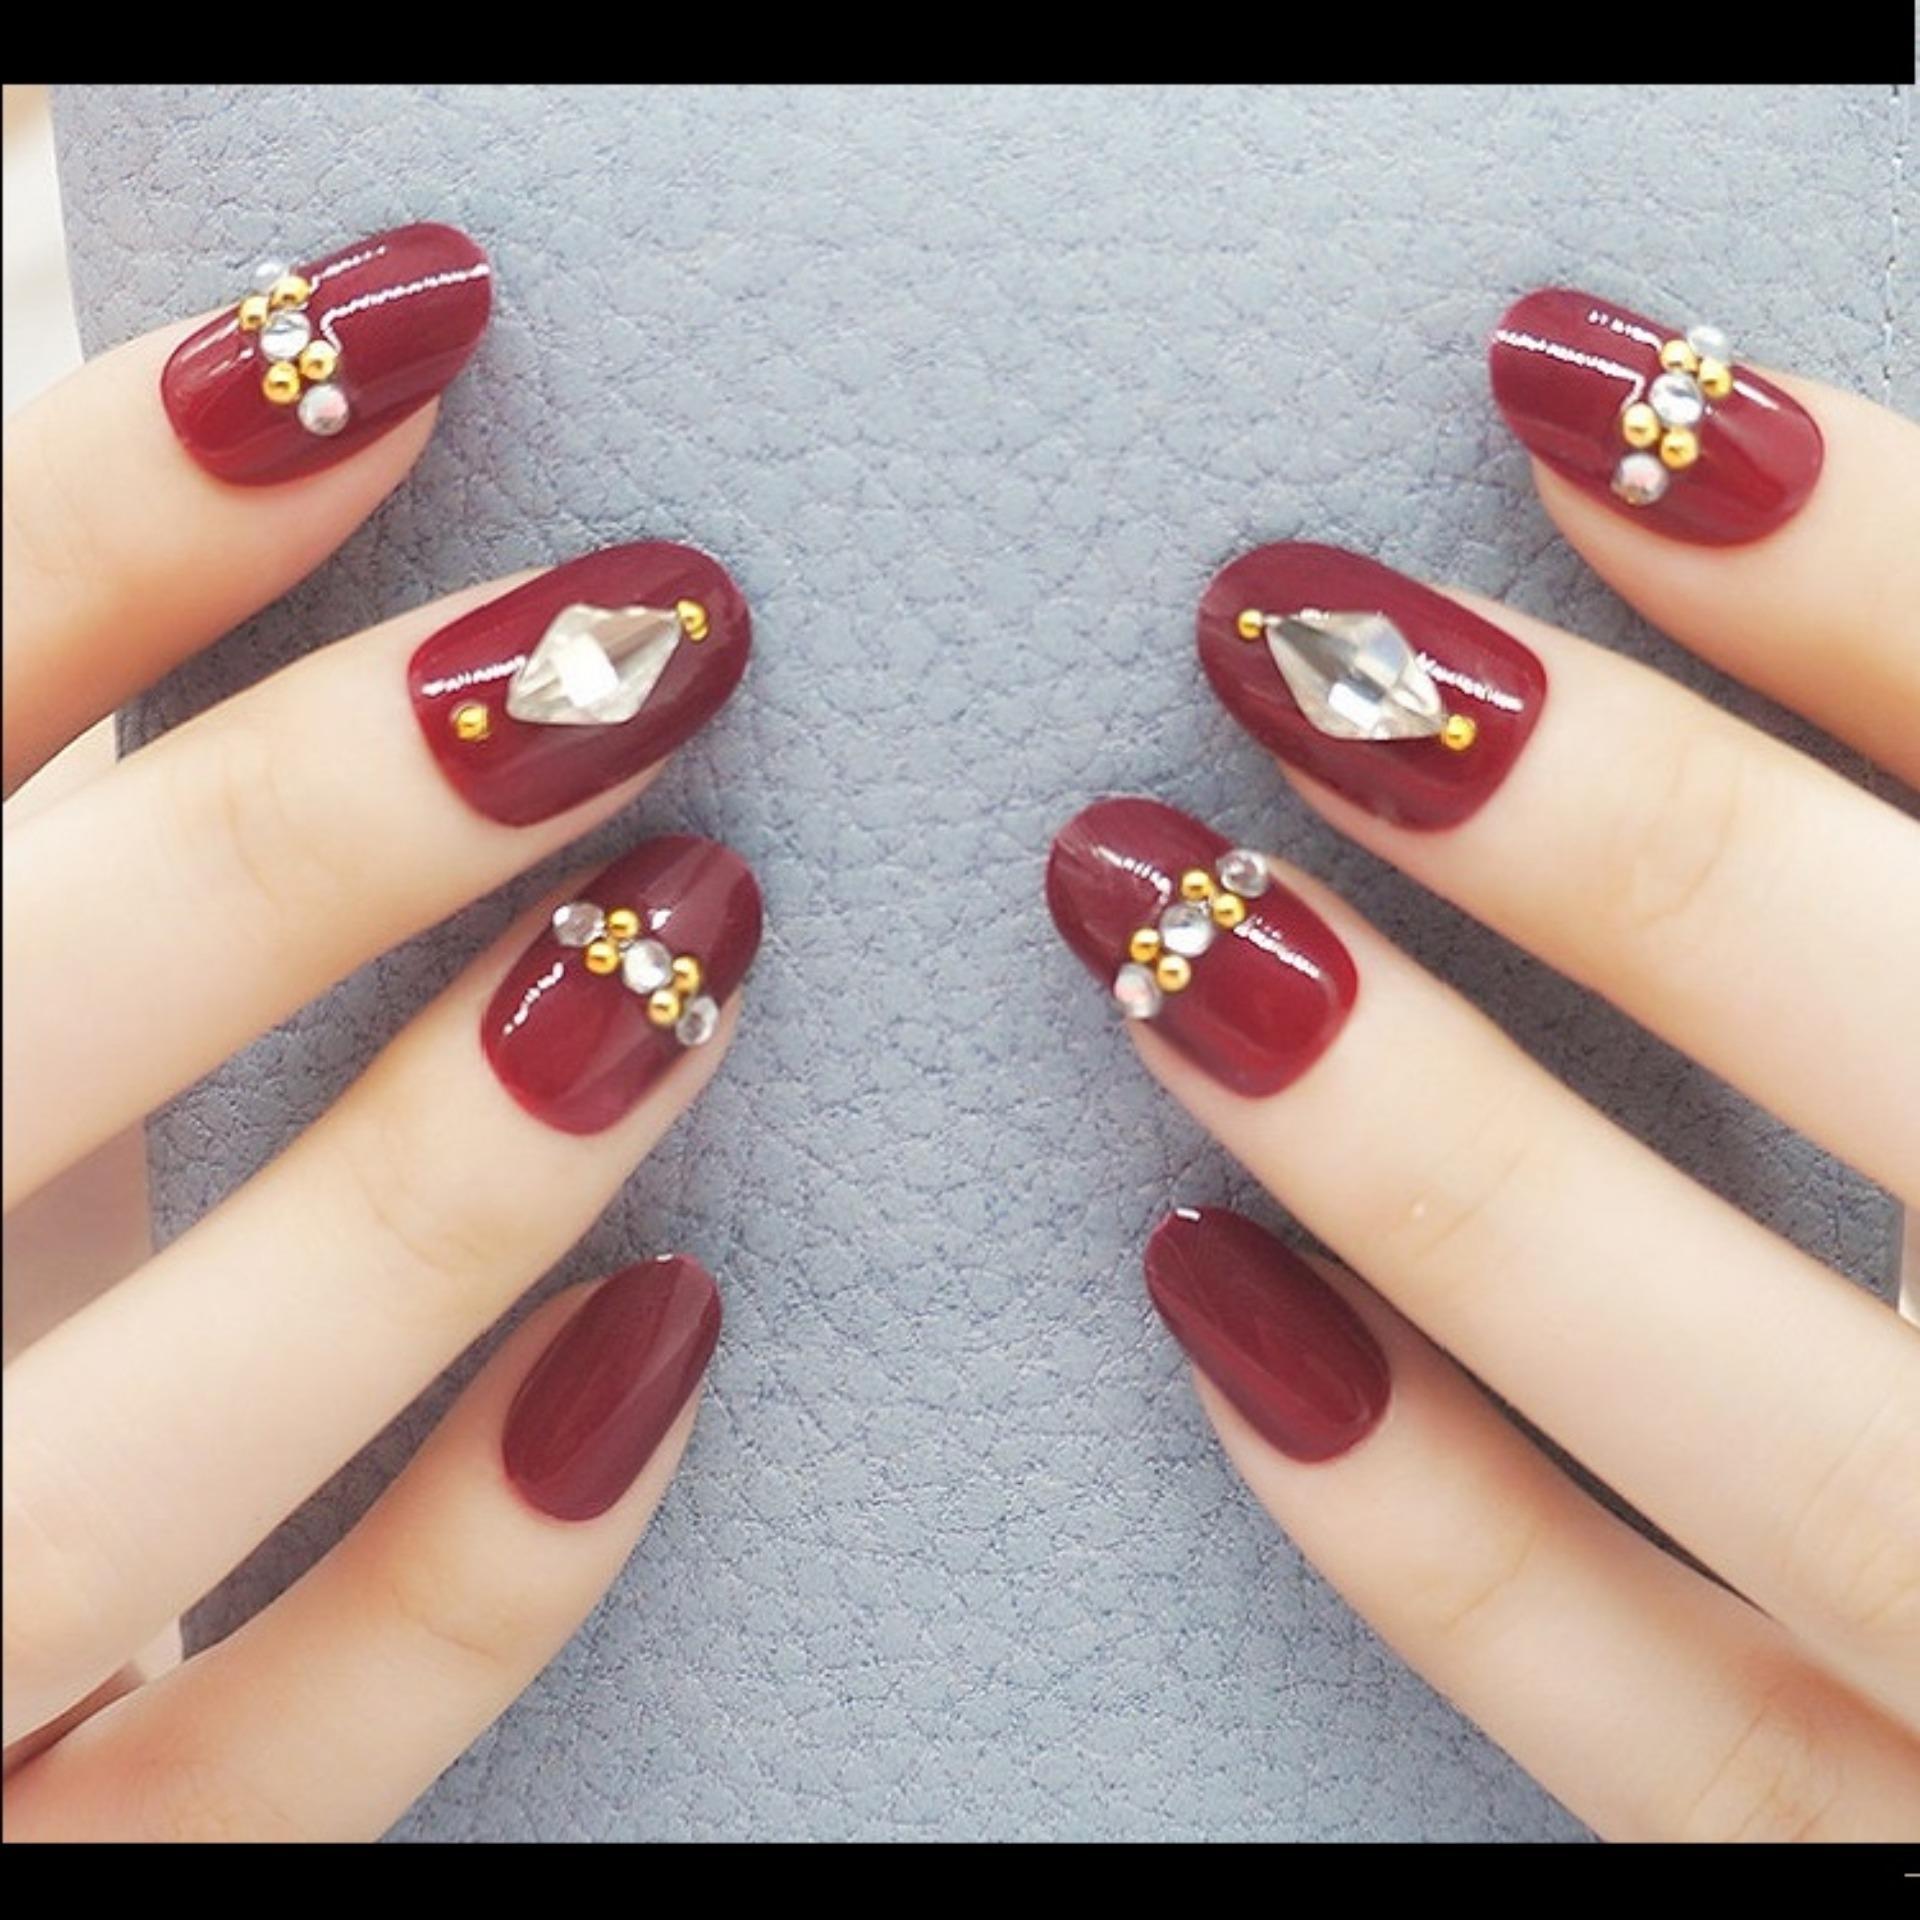 Fitur Jbs Nails Kuku Palsu 3d Fake Nail Art Wedding A29 Dan Harga A41 Aart A18